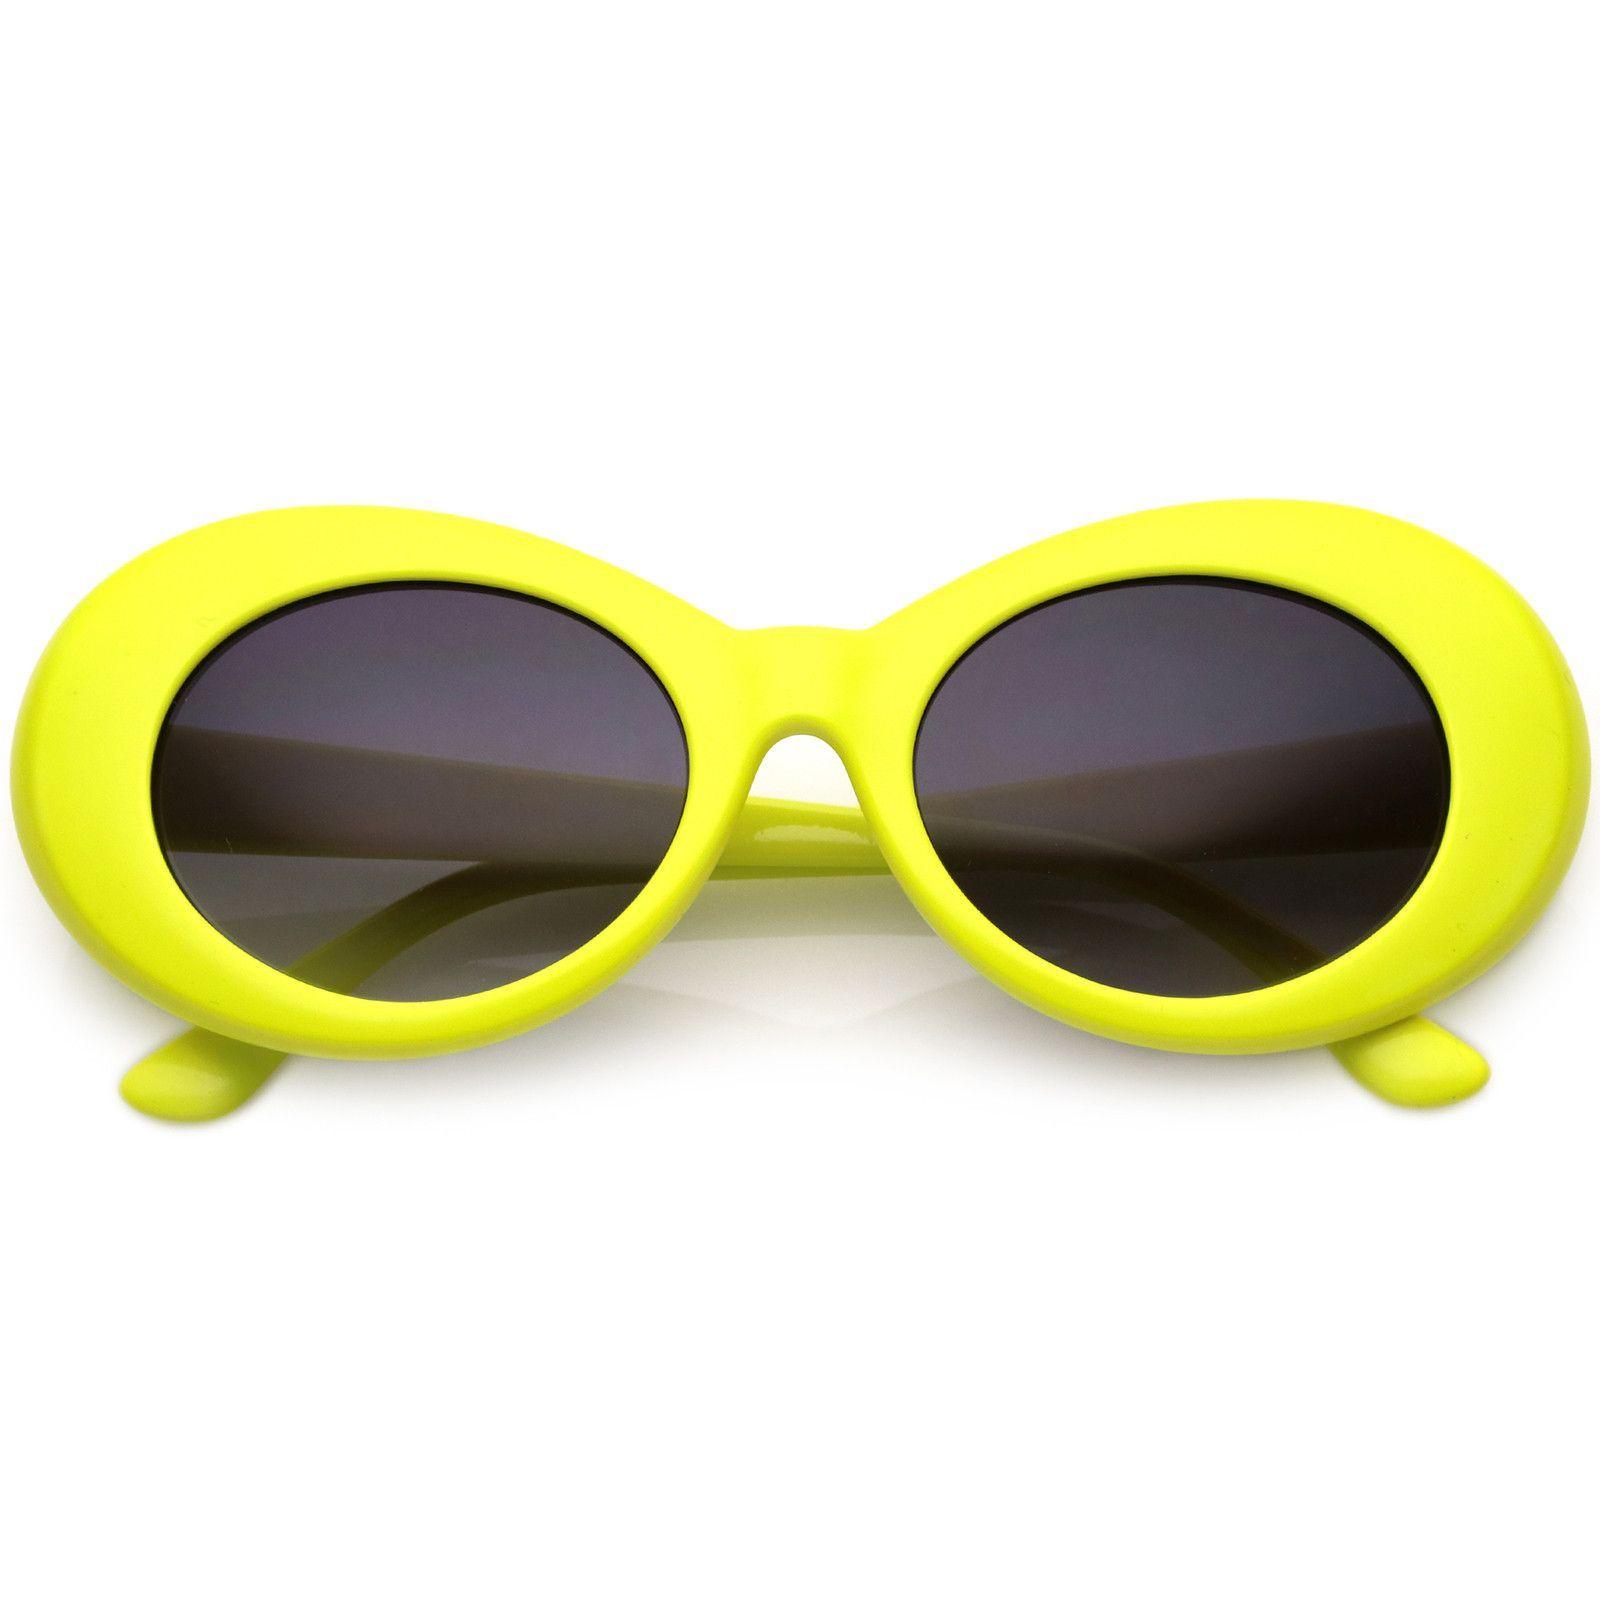 34b2473189 Retro Clout Oval Round 90 s Gradient Lens Sunglasses C448 in 2019 ...